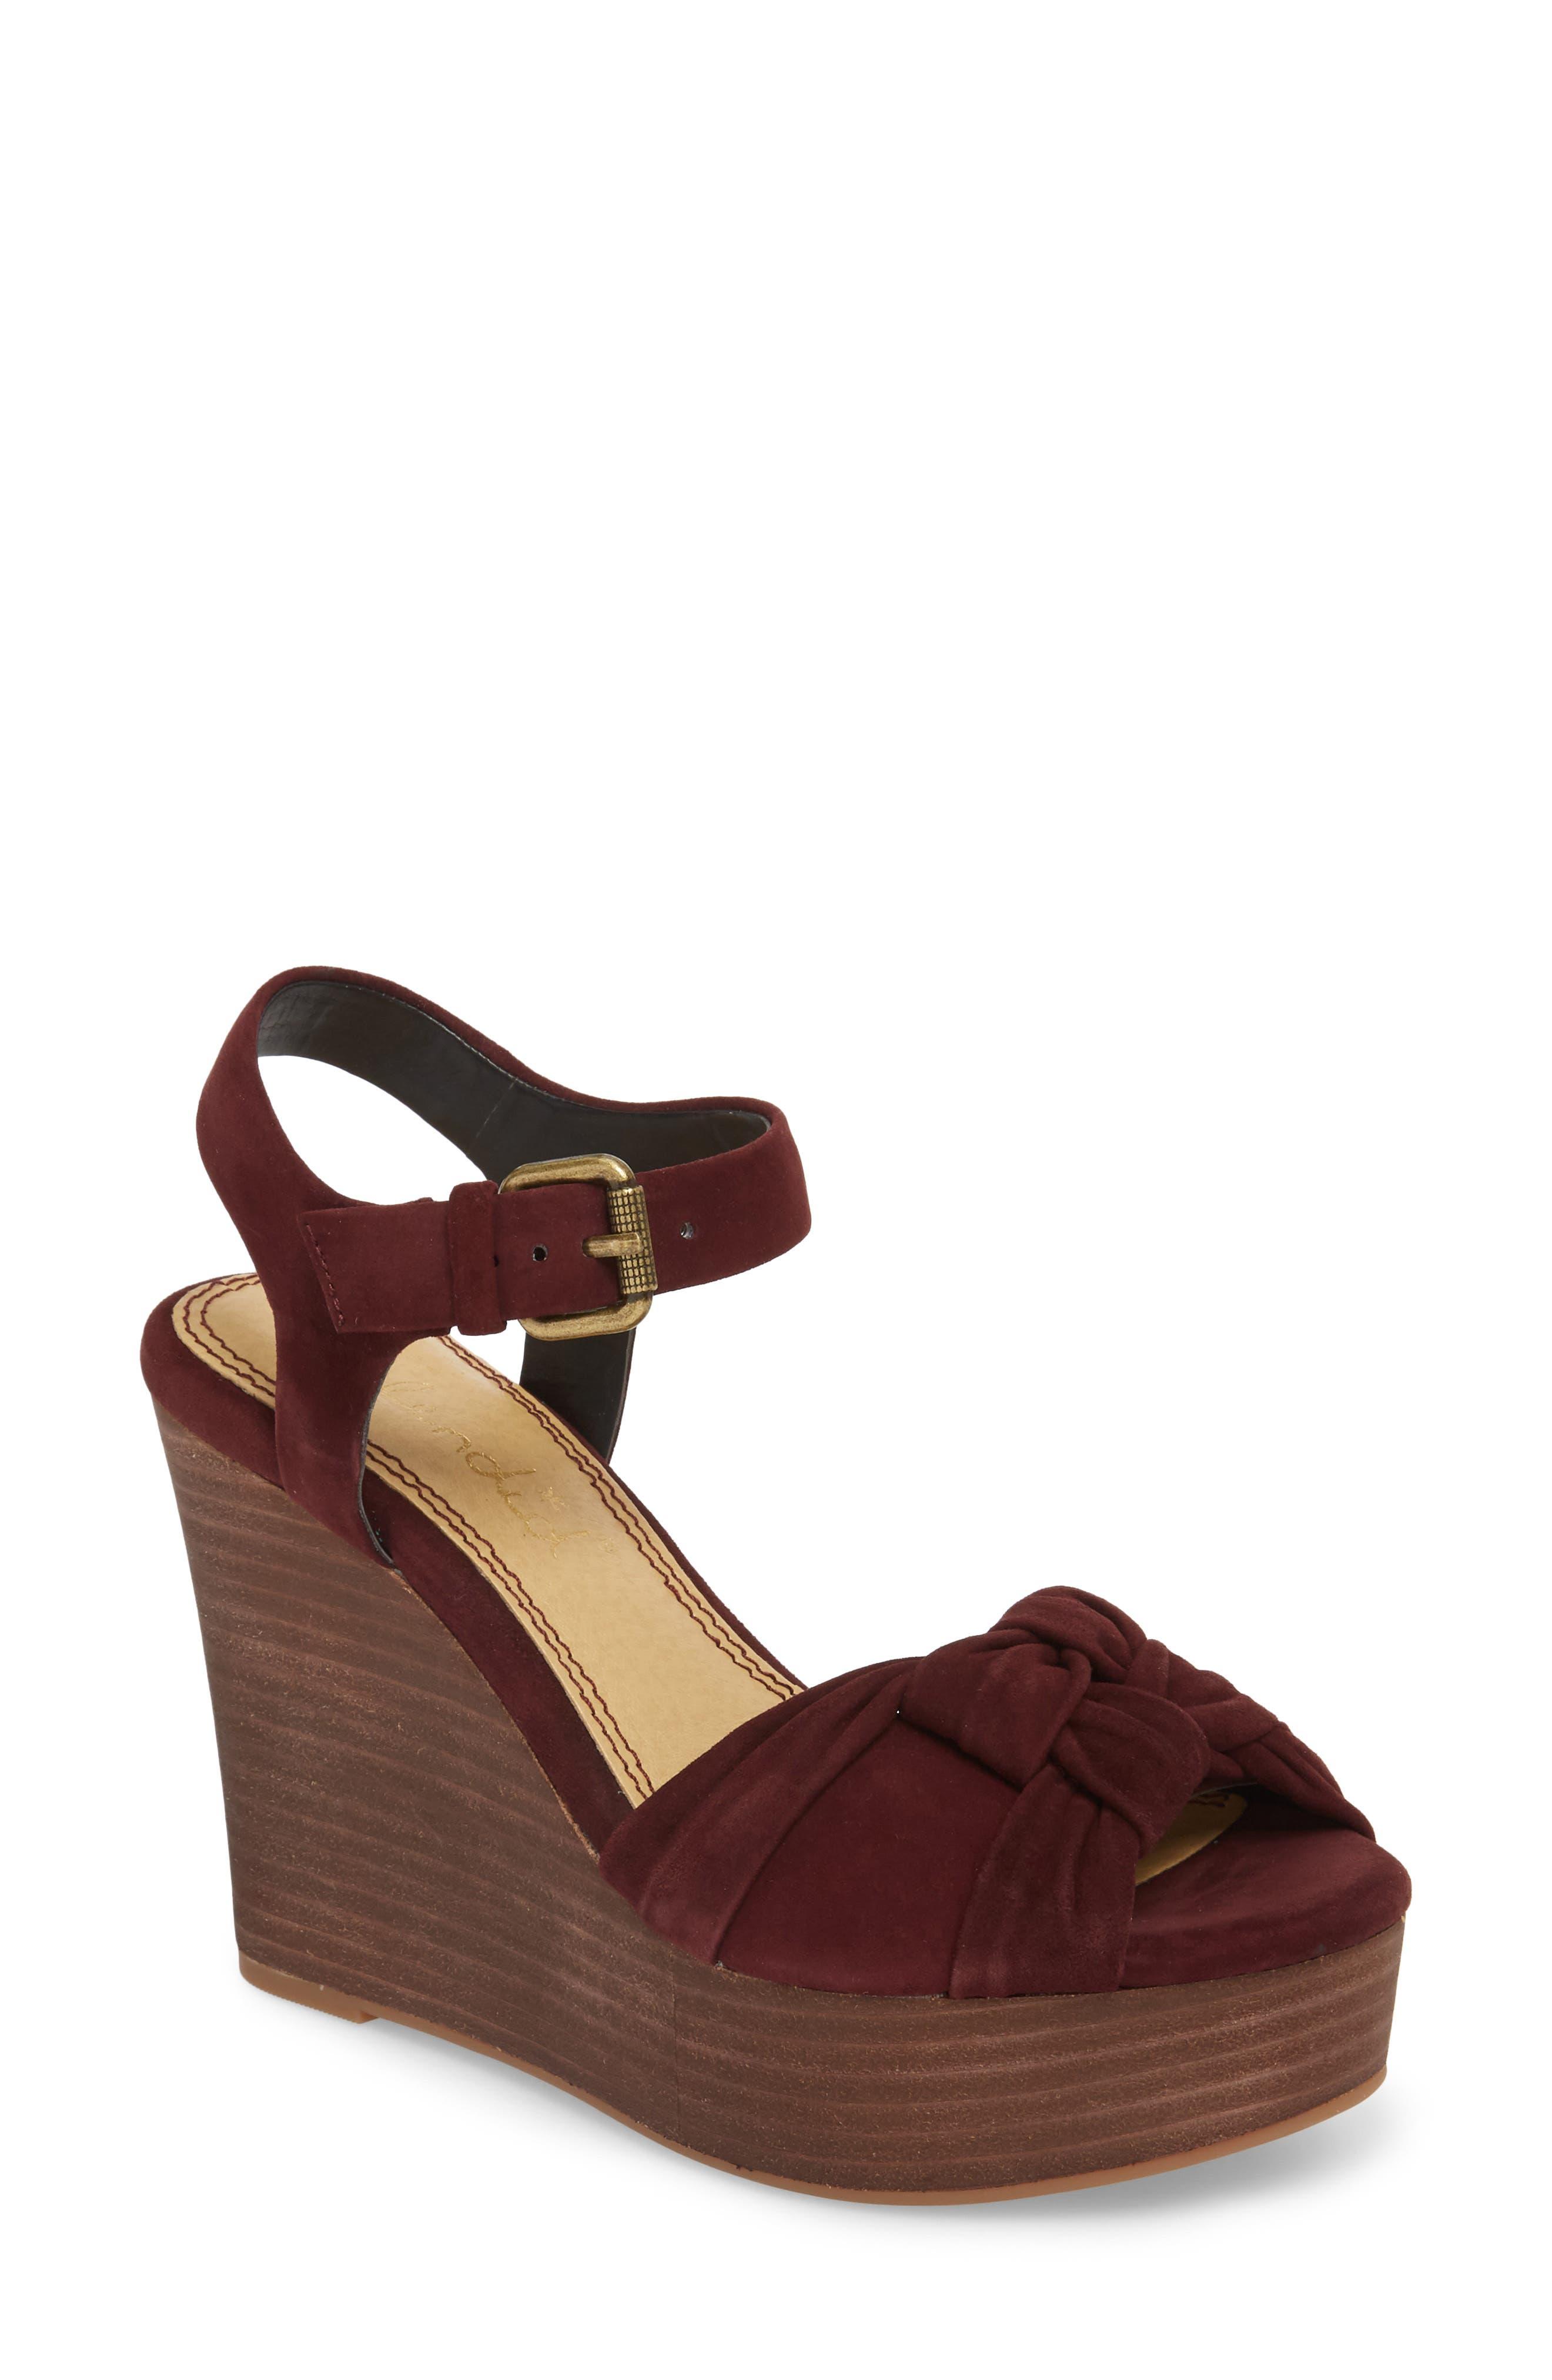 Nada Platform Wedge Sandal,                             Main thumbnail 1, color,                             Deep Plum Suede